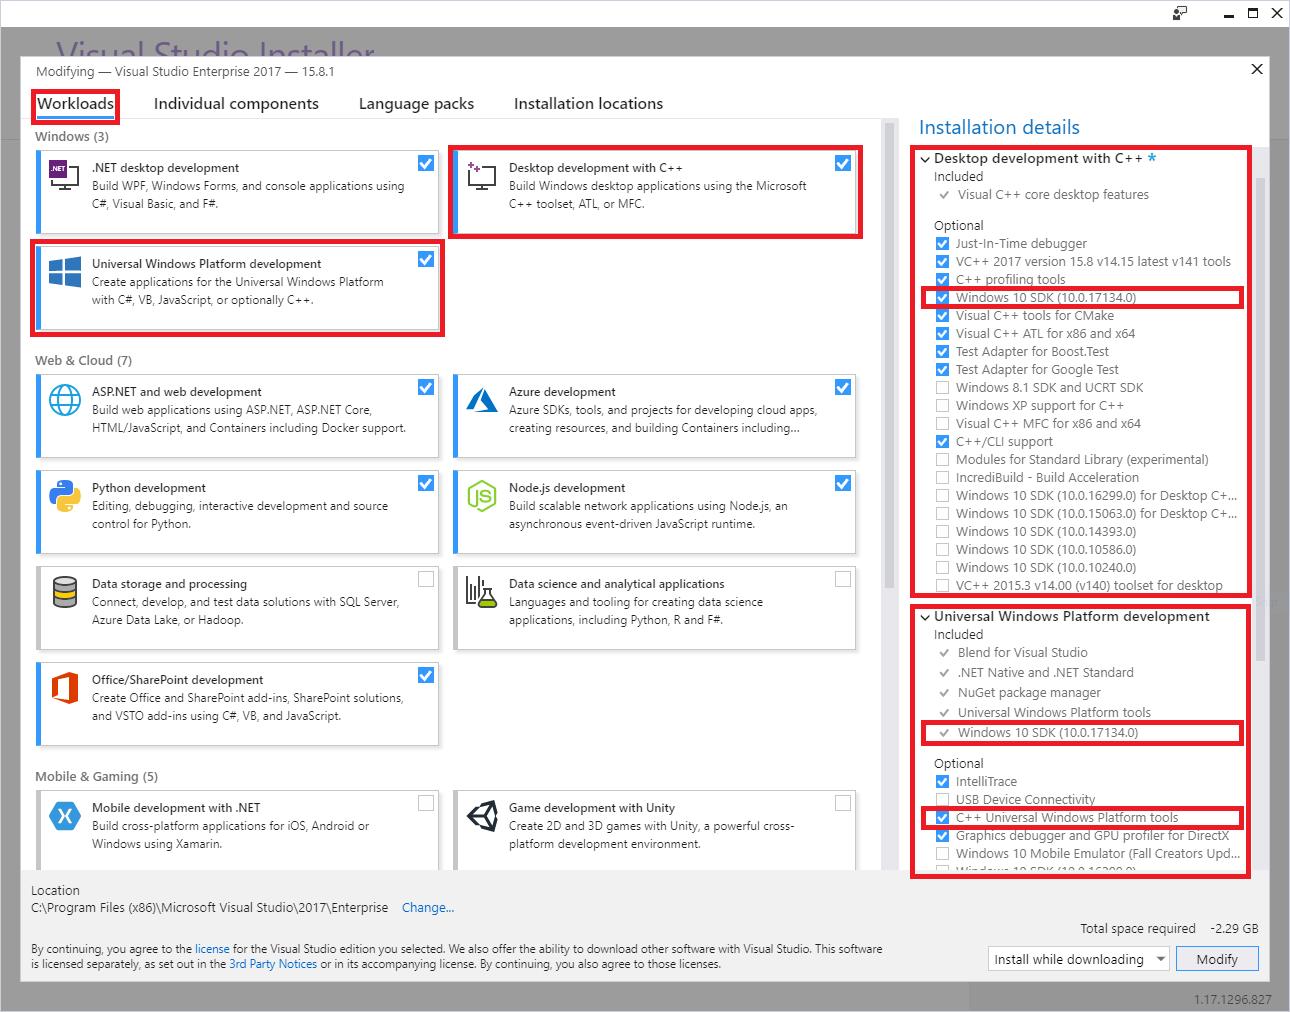 Microsoft Information Protection (MIP) SDK setup and